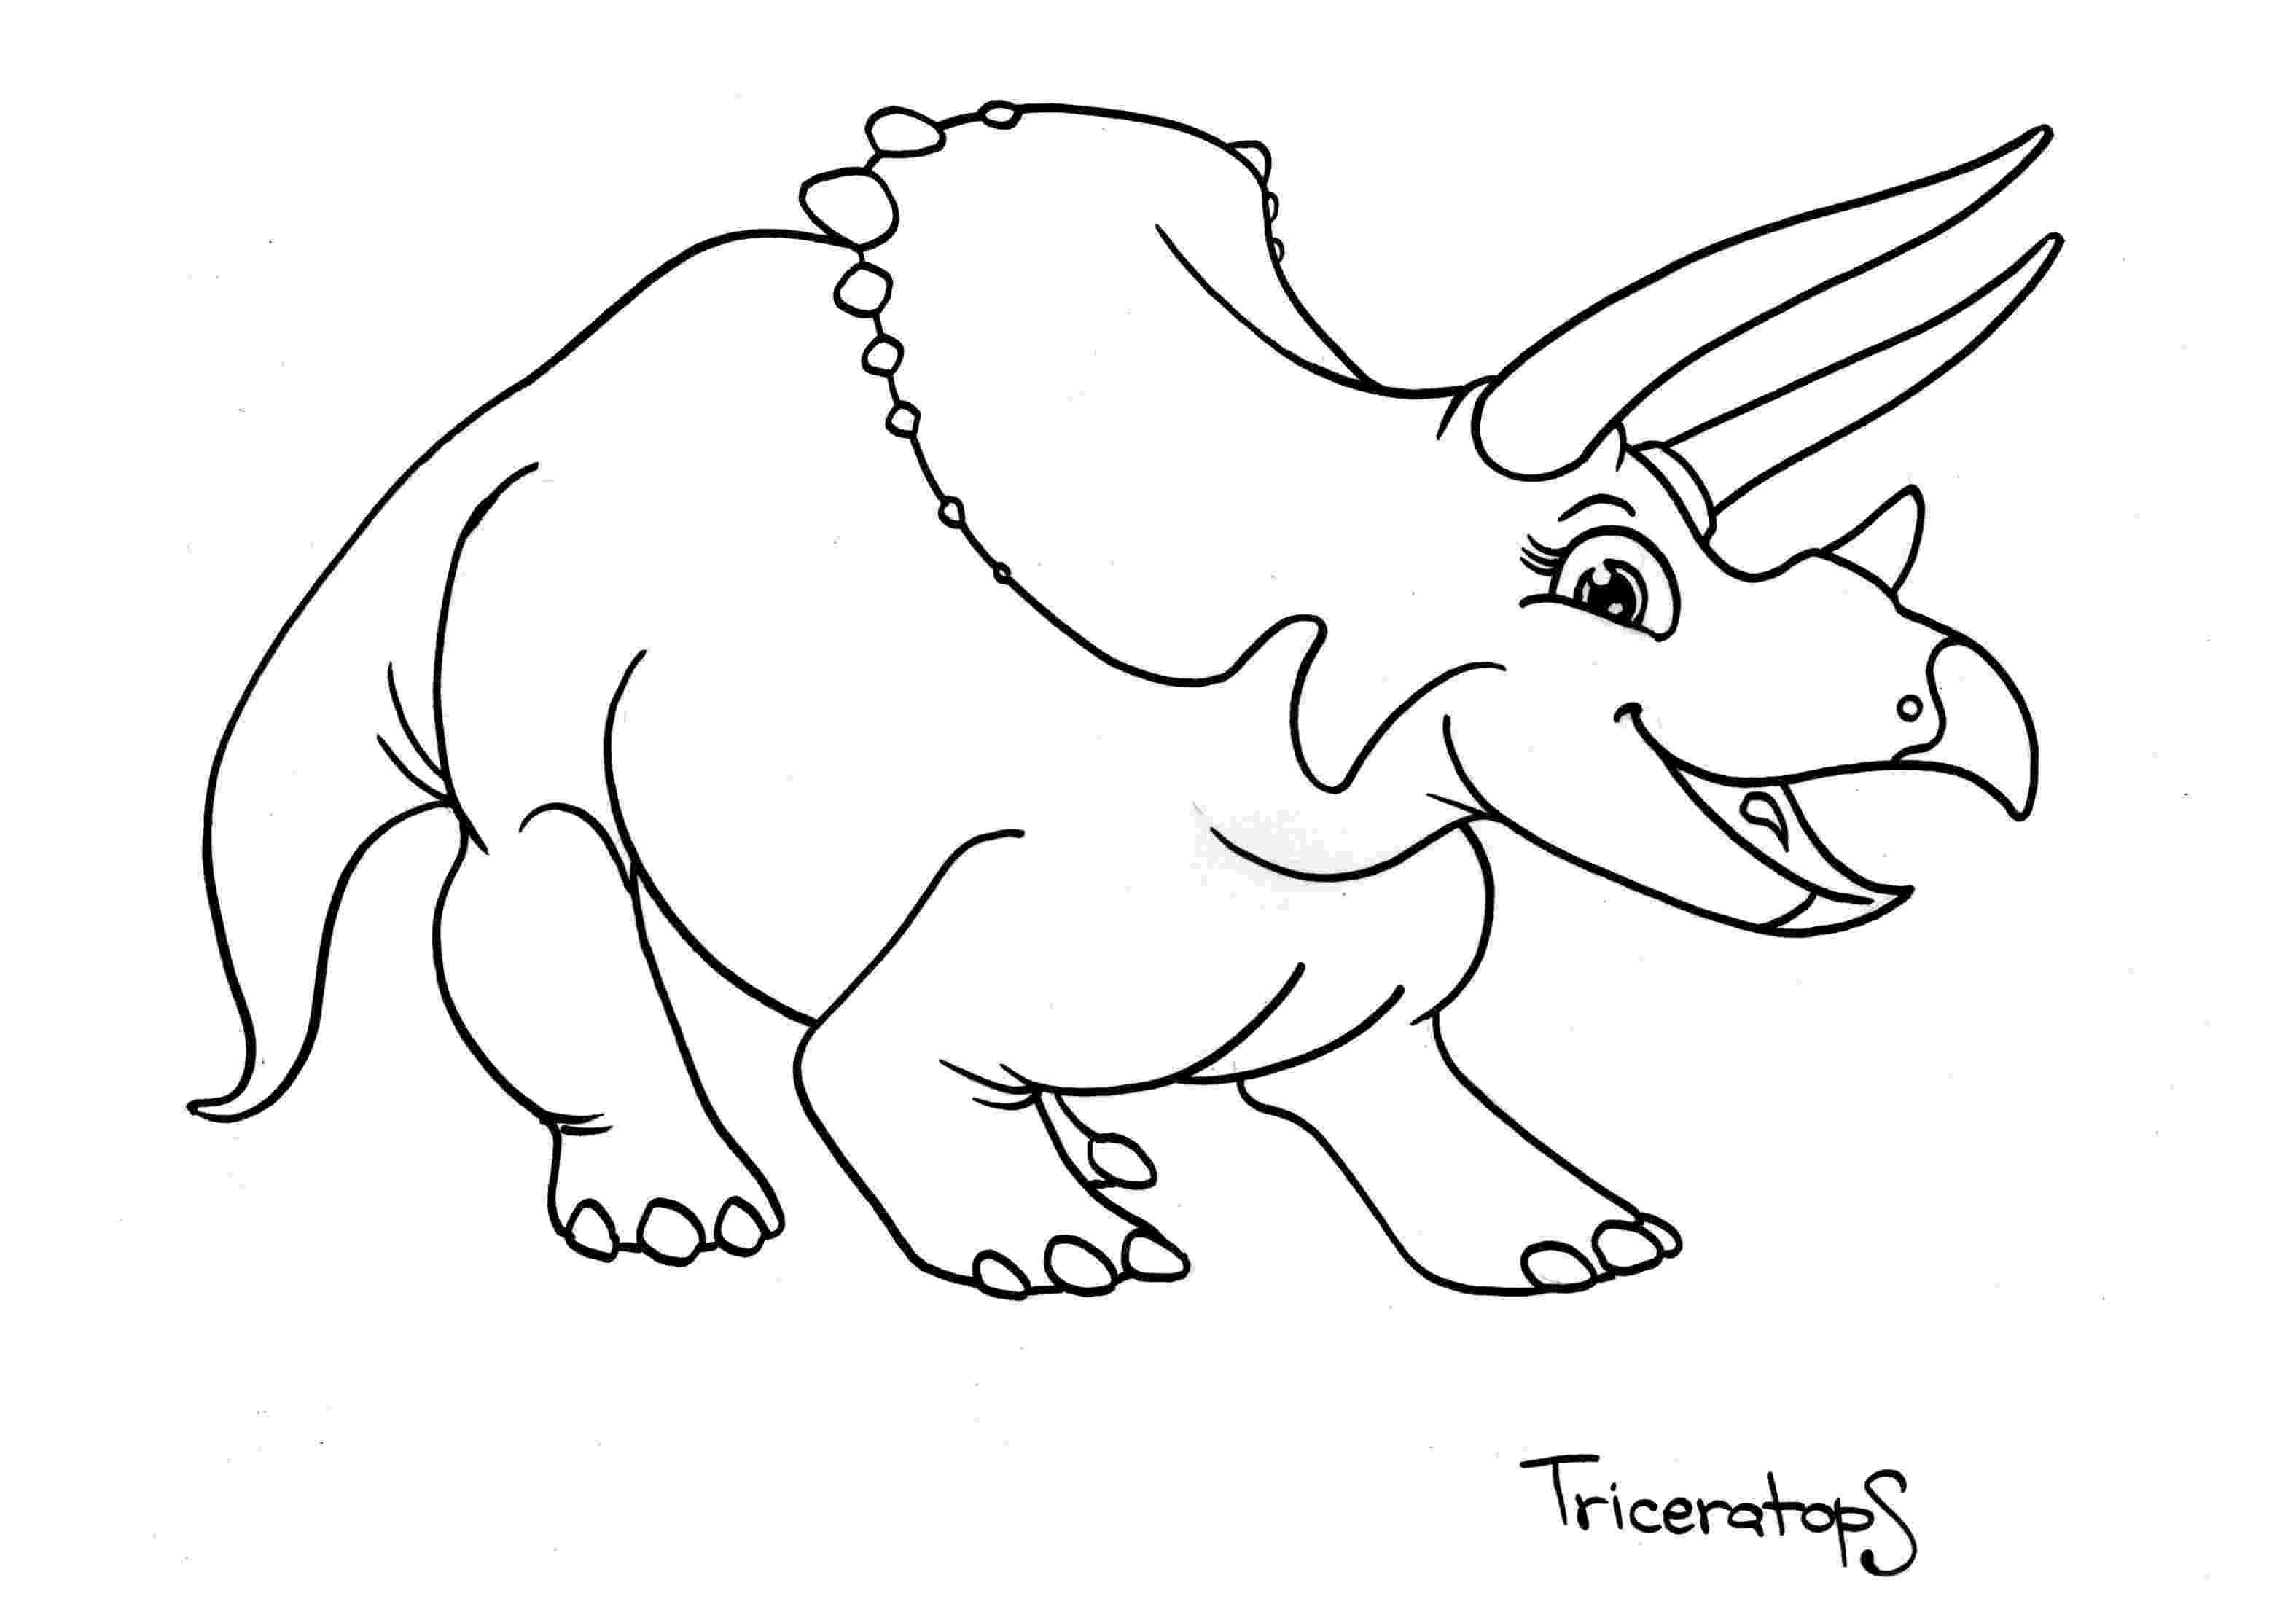 free printable dinosaurs dinosaur coloring pages free printable pictures coloring dinosaurs printable free